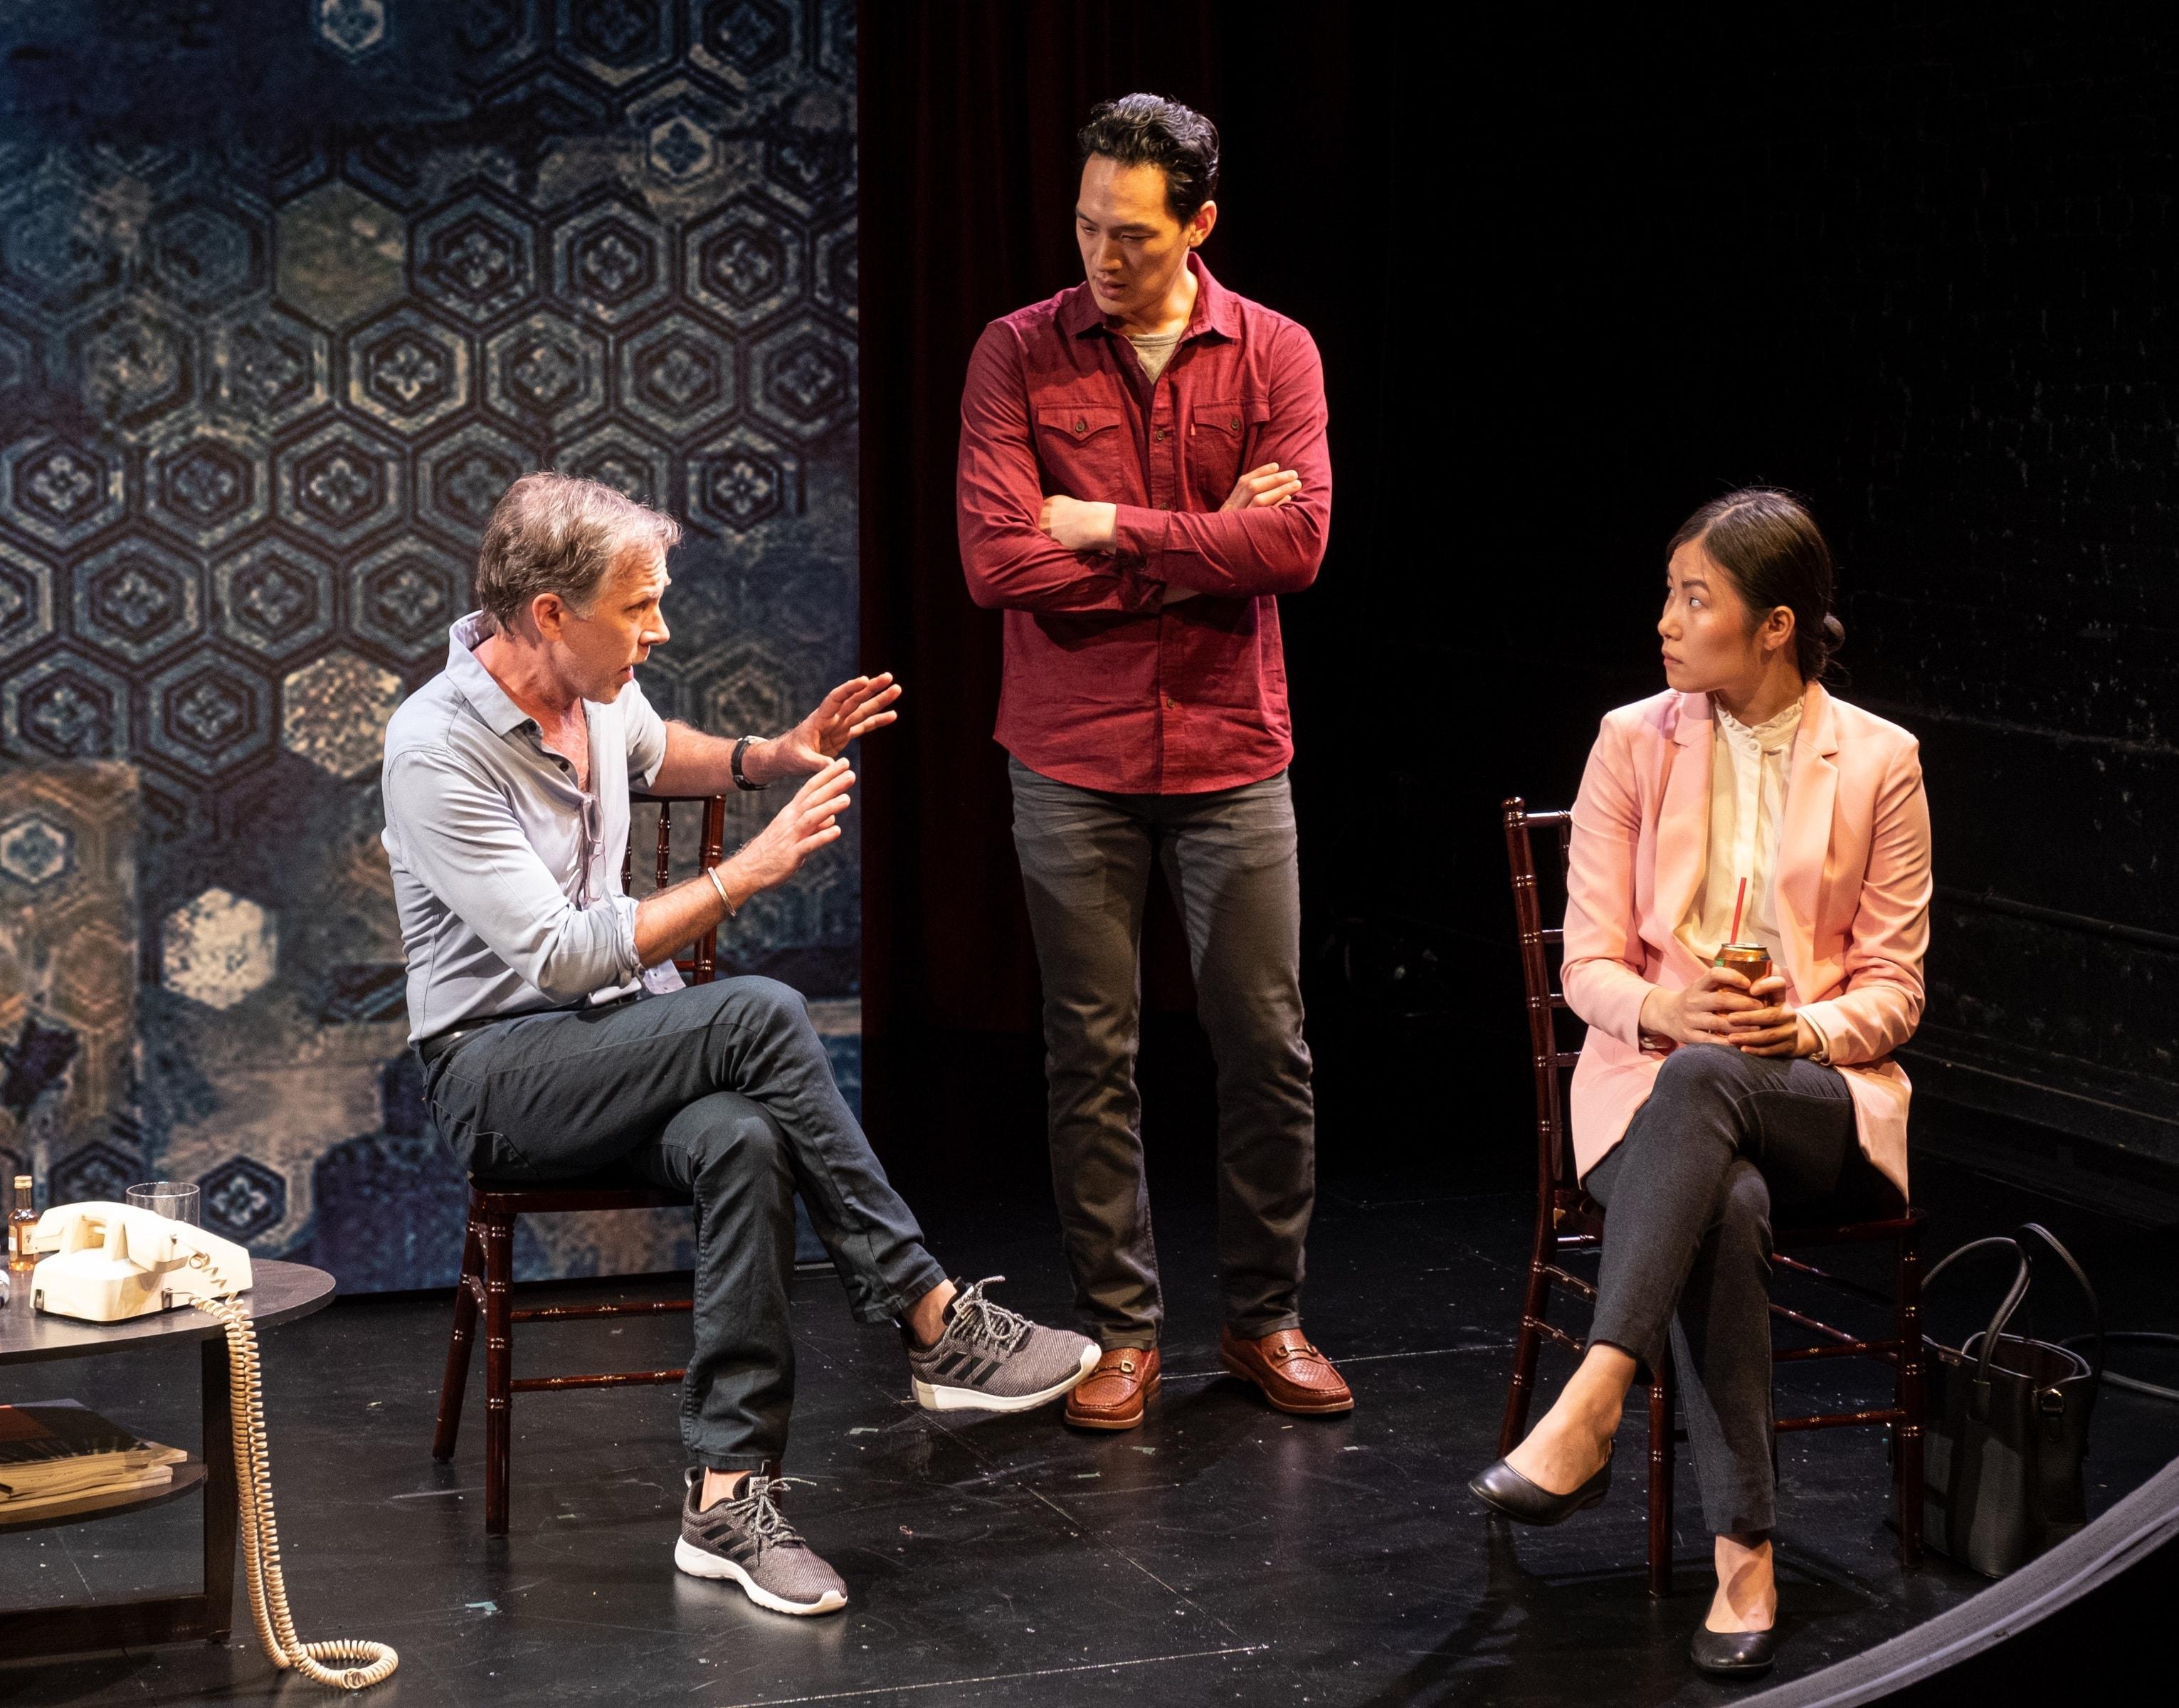 Bruce McKenzie, Edward Chin-Lyn, and Karoline Xu in <i>Veil Widow Conspiracy</i> (Photo: William P. Steele)